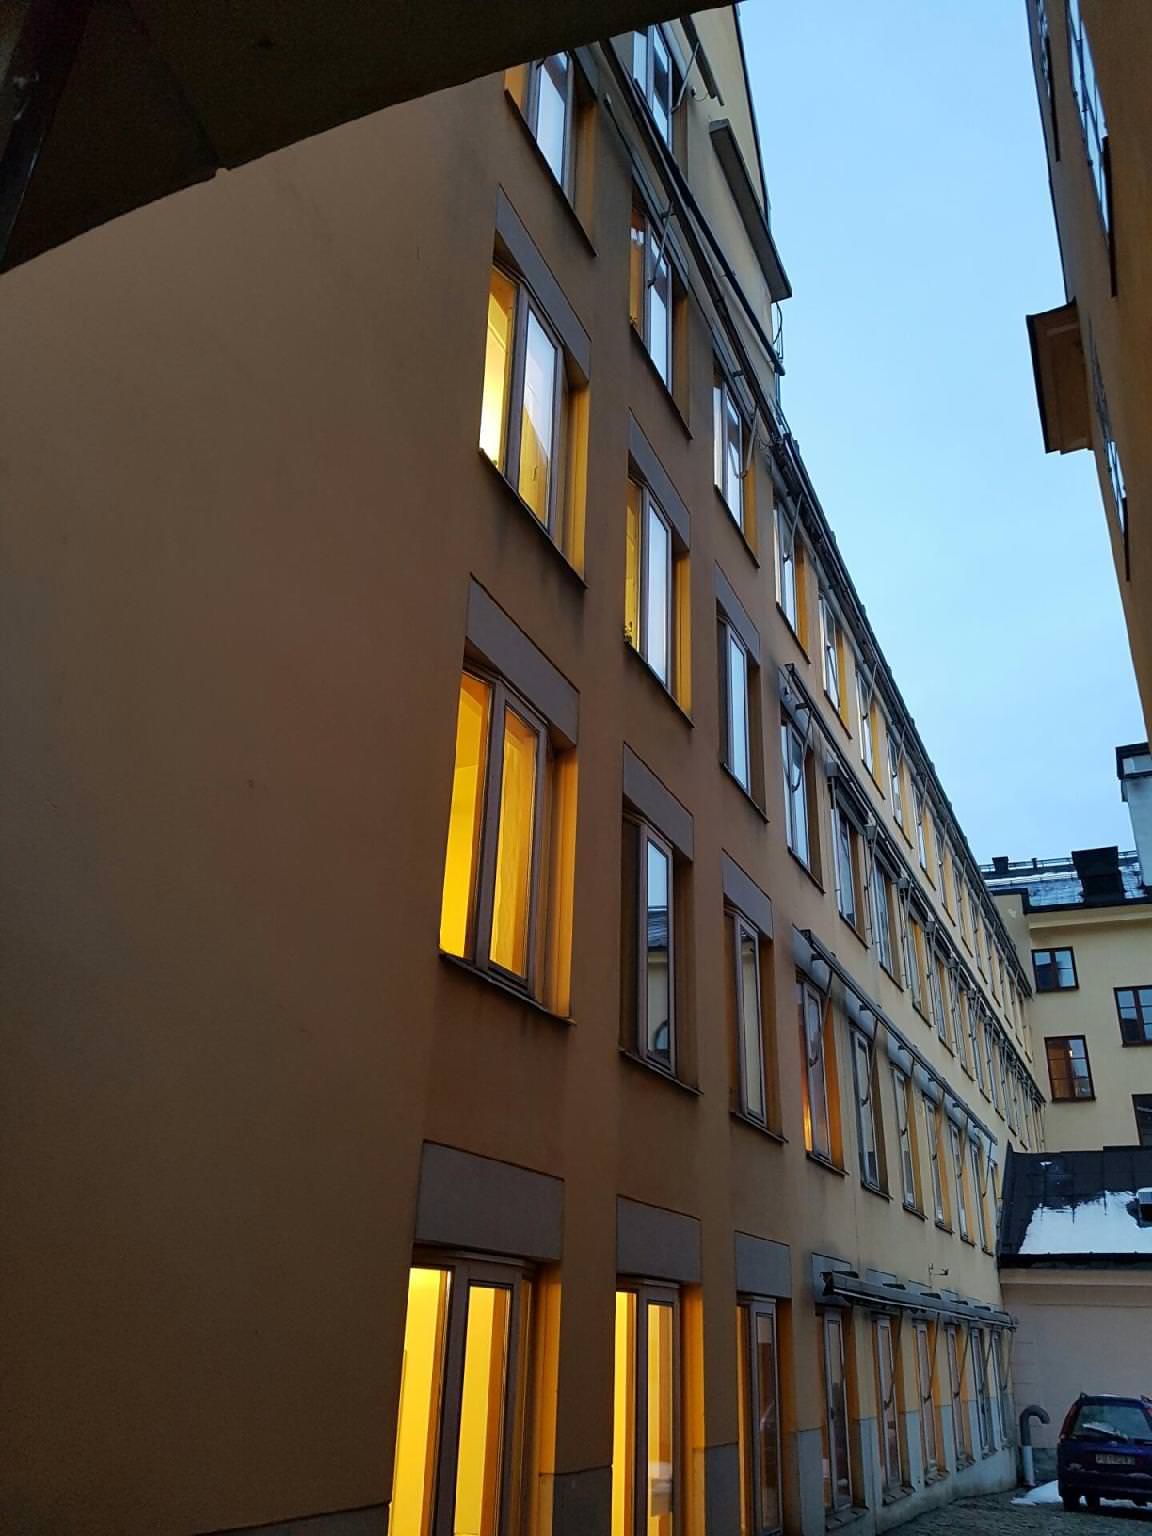 Ladugårdsbron 12-image1